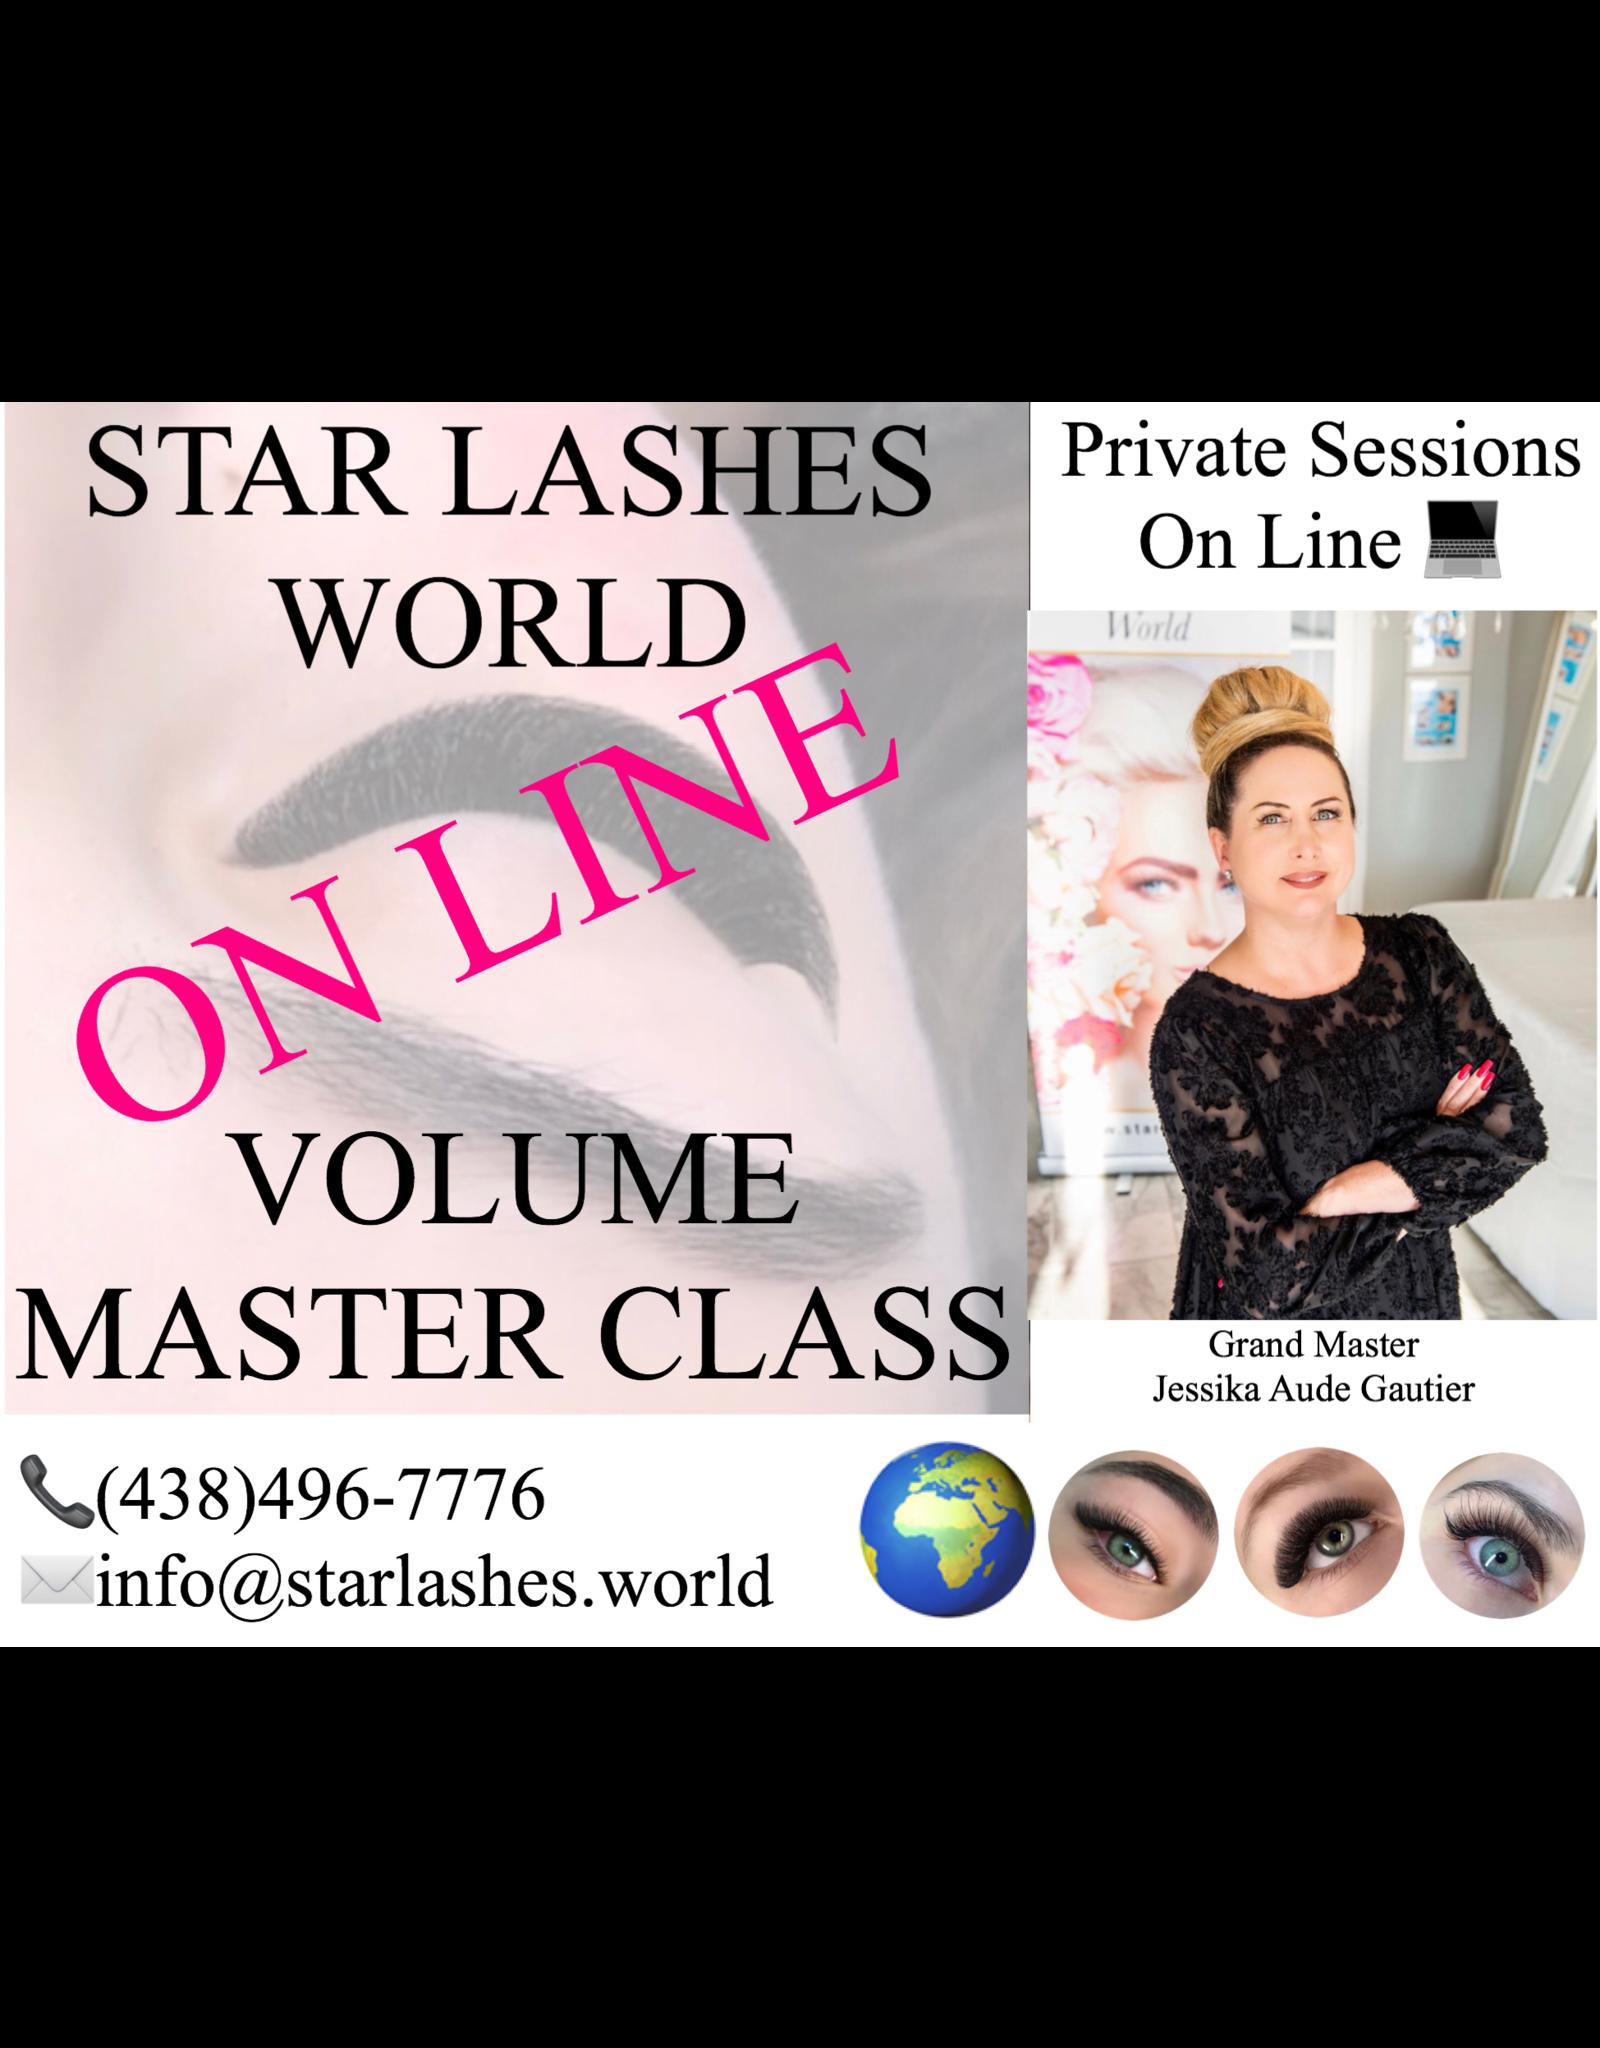 Star Lashes World Online Volume Master Class